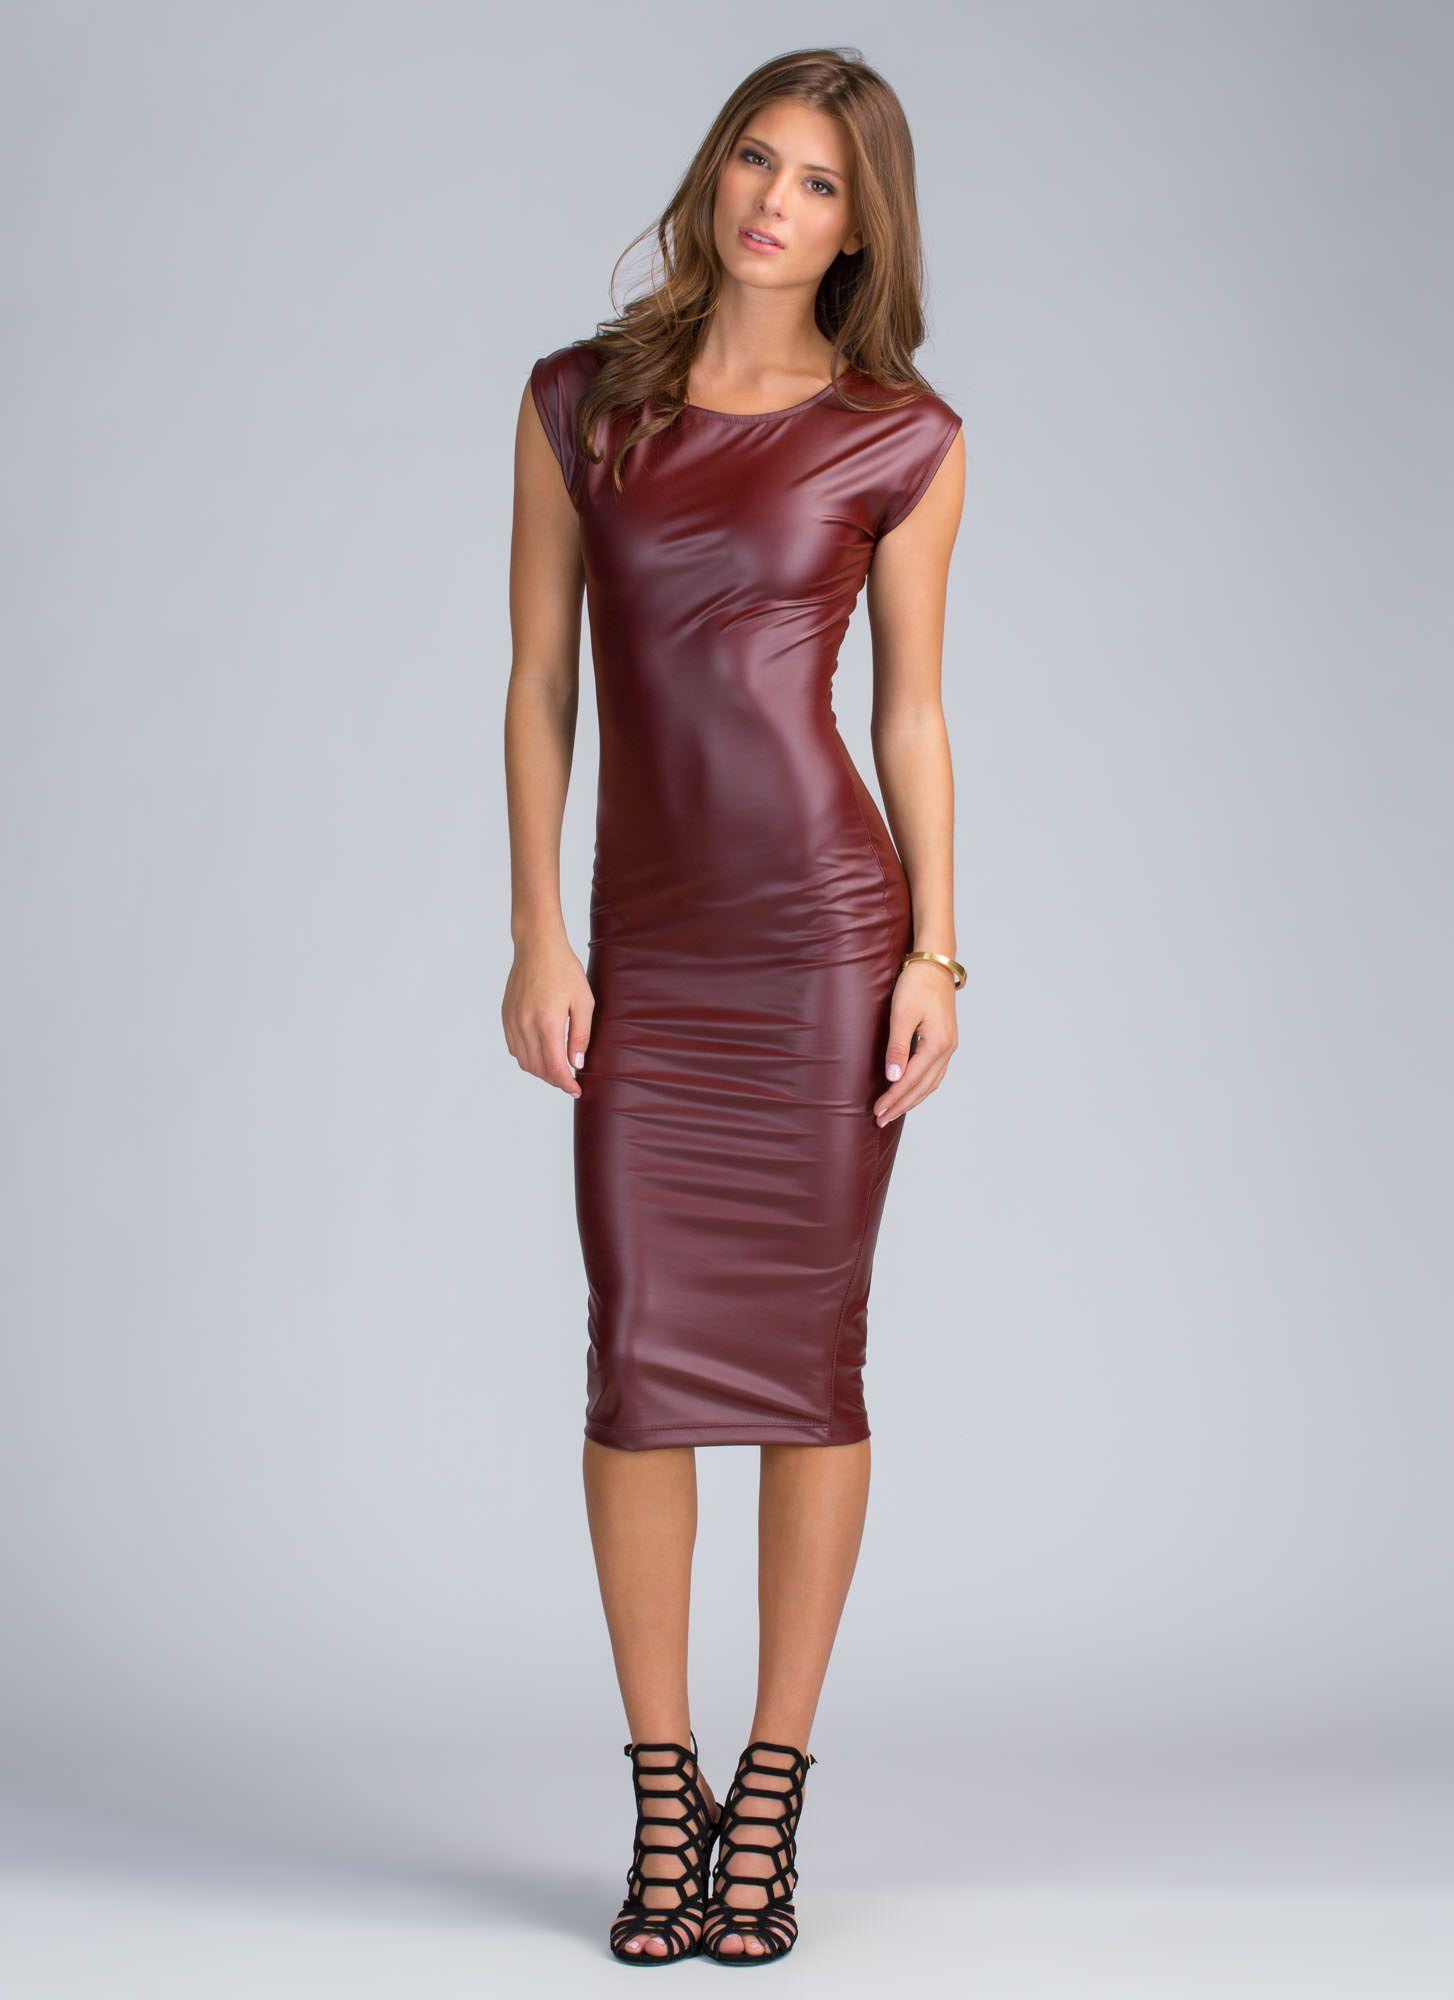 To Die Faux Leather Midi Dress Black Burgundy Leather Midi Dress Leather Dresses Dresses [ 2000 x 1454 Pixel ]